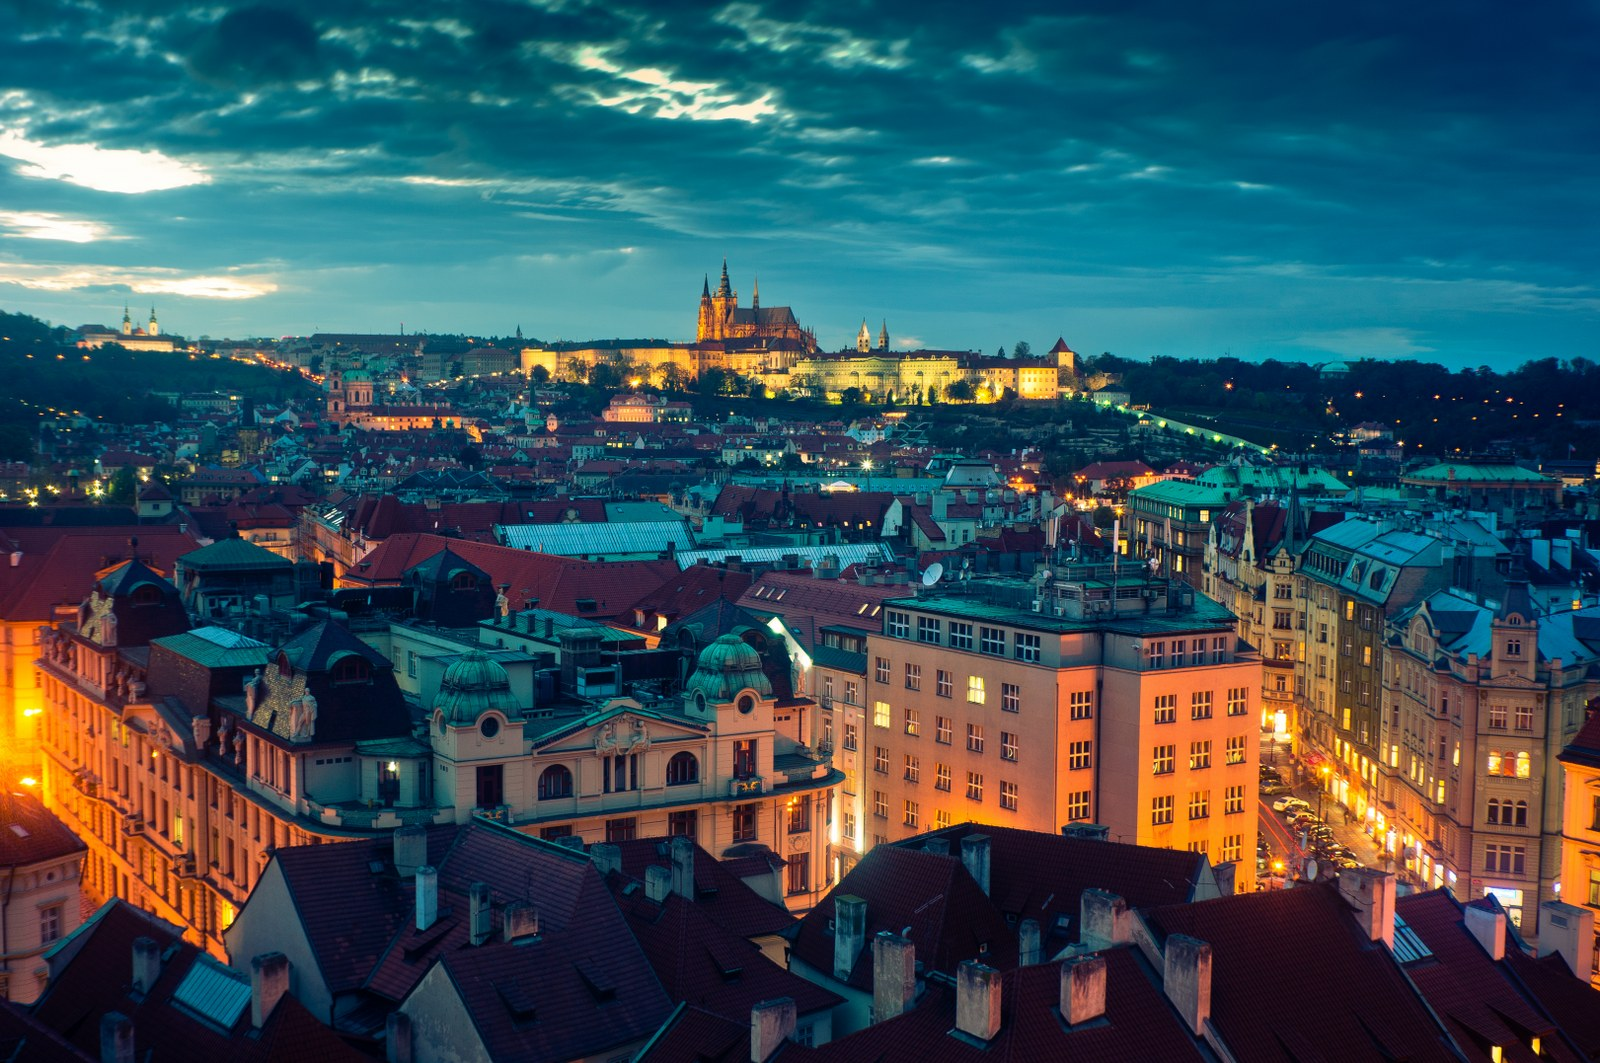 City in the Czech Republic, Prague